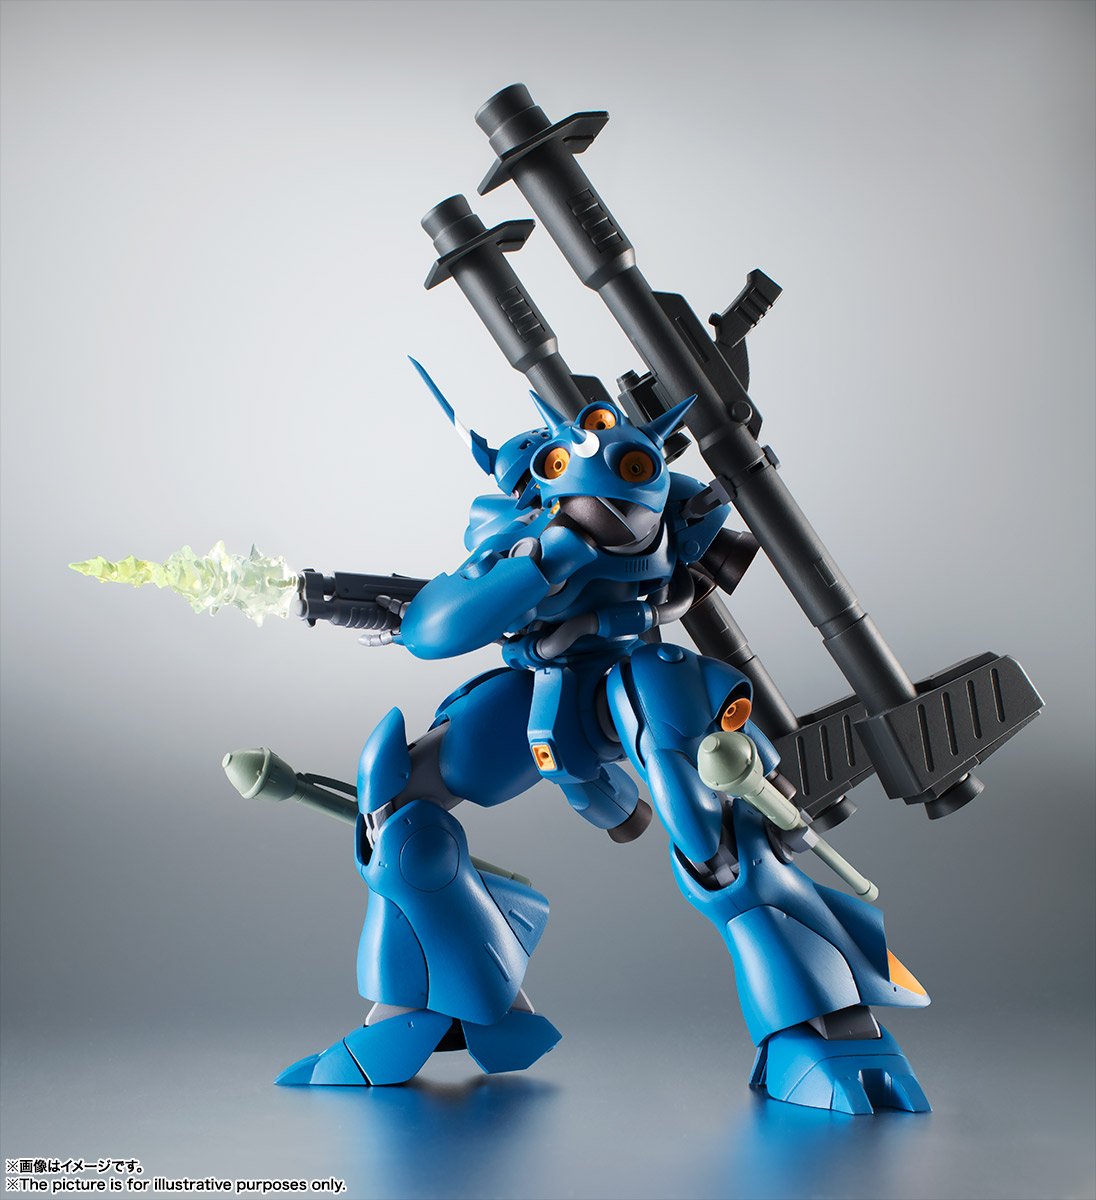 ROBOT魂〈SIDE MS〉『MS-18E ケンプファー ver. A.N.I.M.E.』機動戦士ガンダム0080 ポケットの中の戦争 可動フィギュア-008